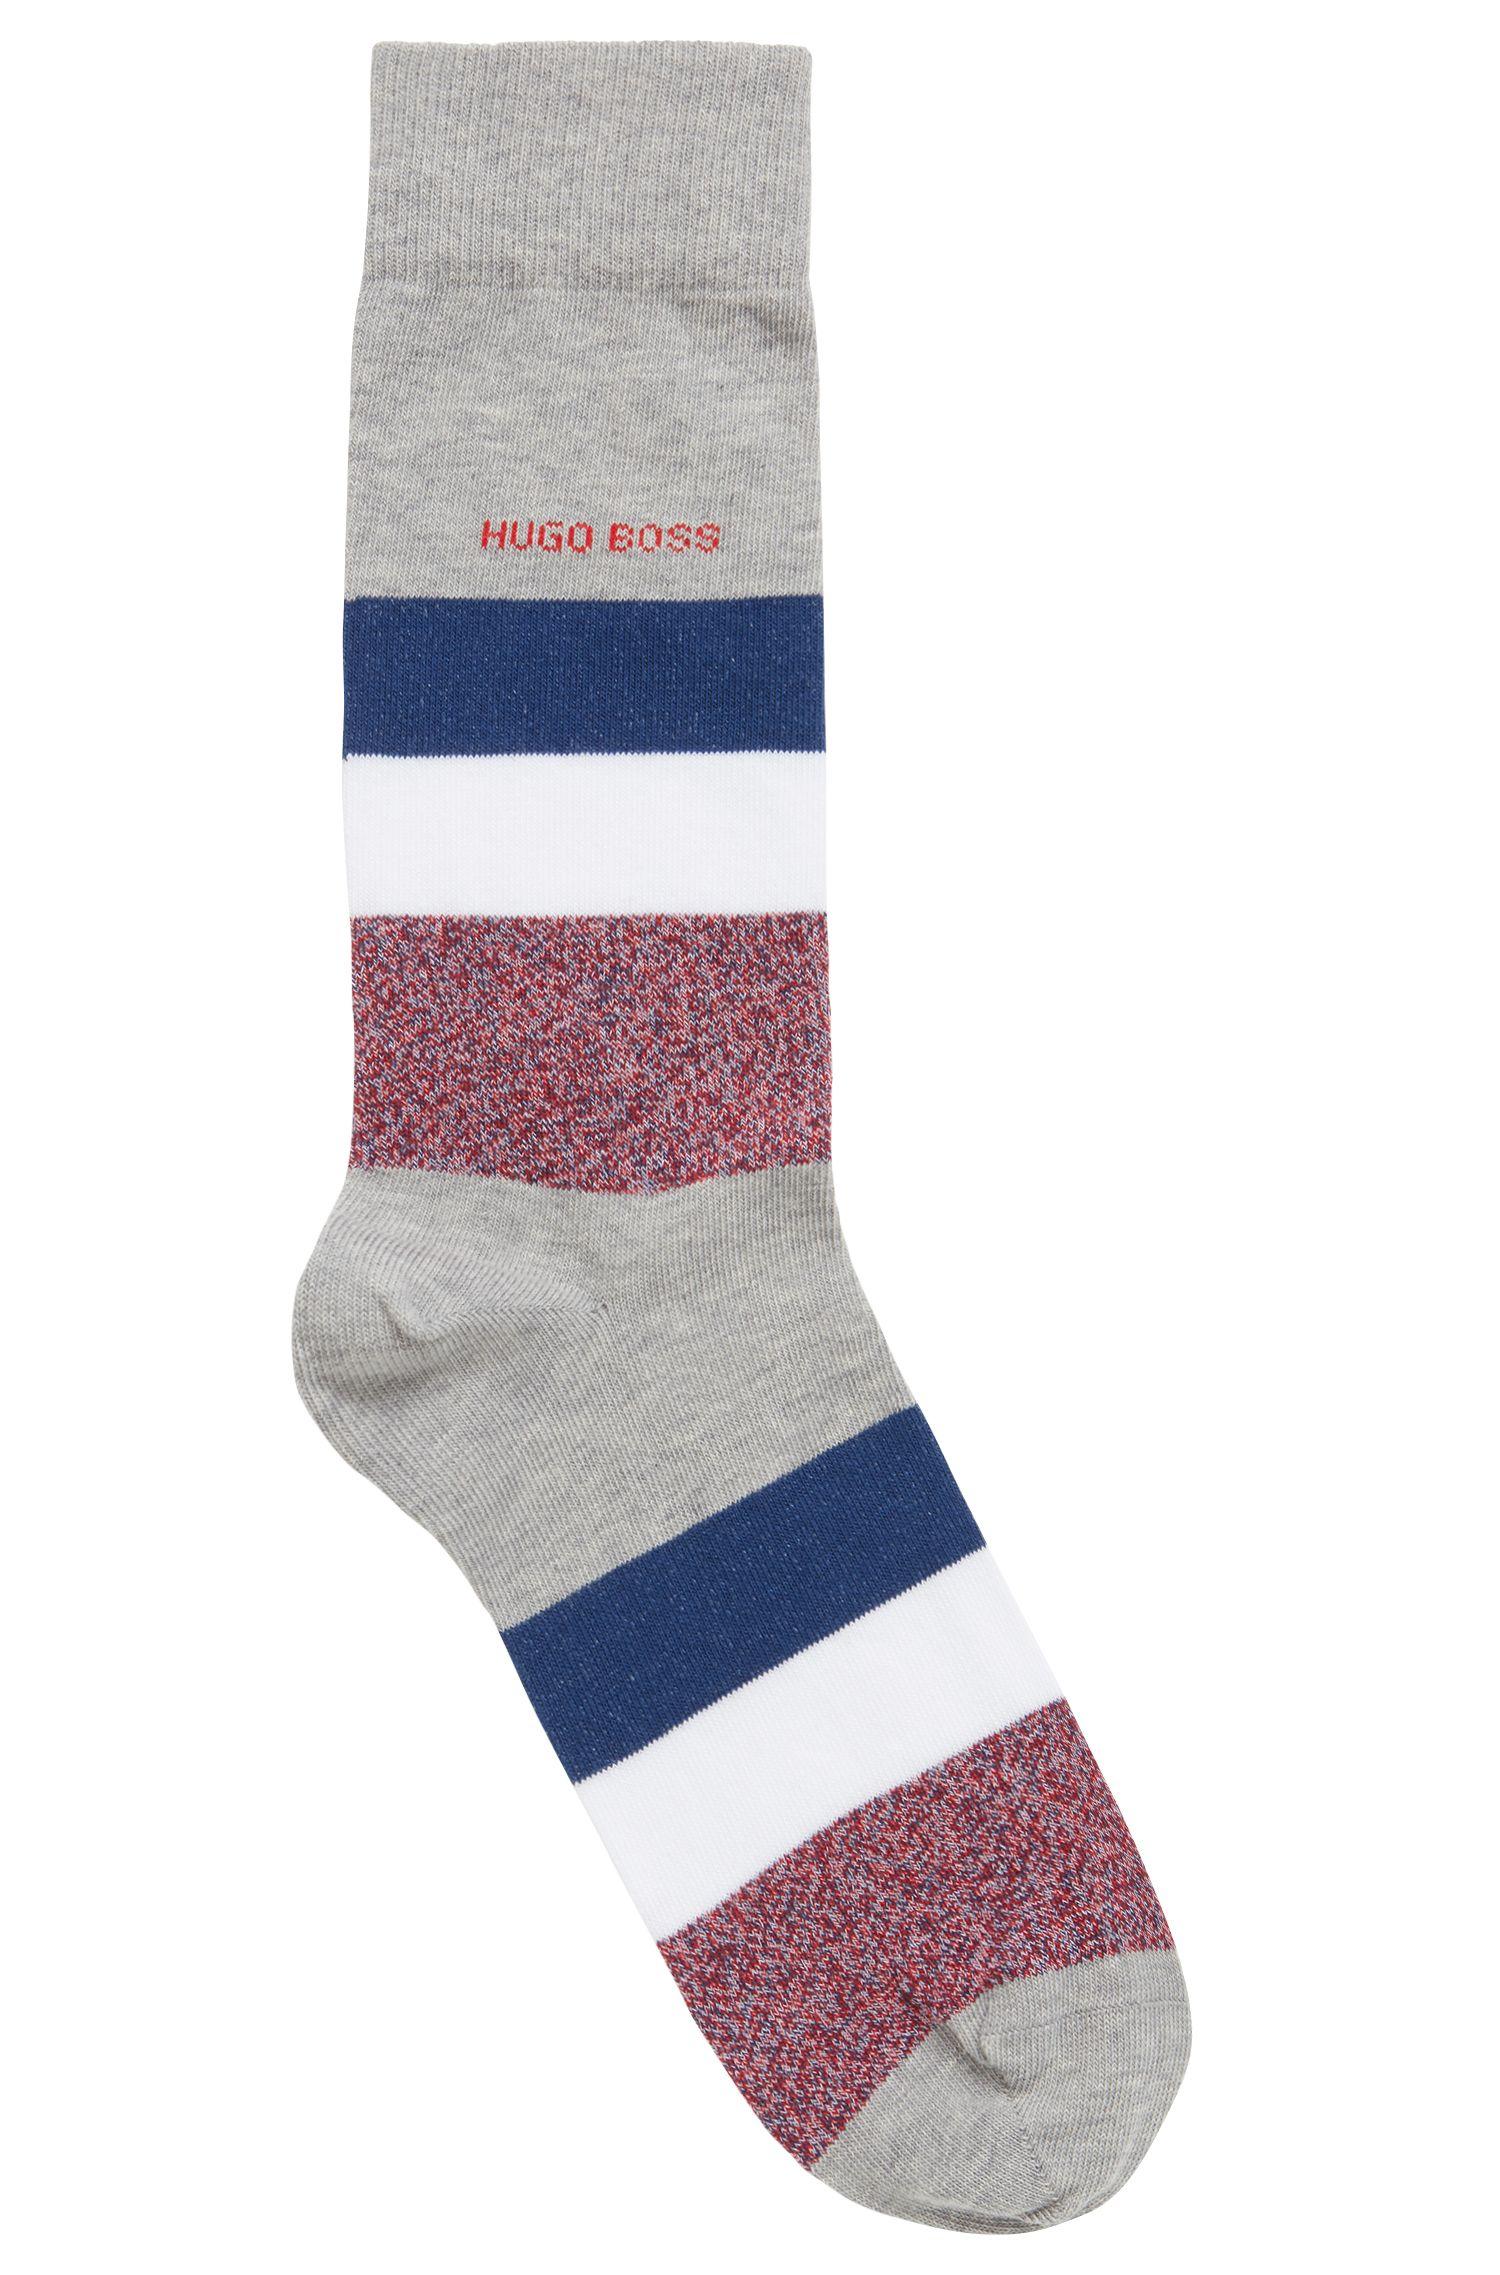 Mittelhohe Socken mit Blockstreifen, Silber